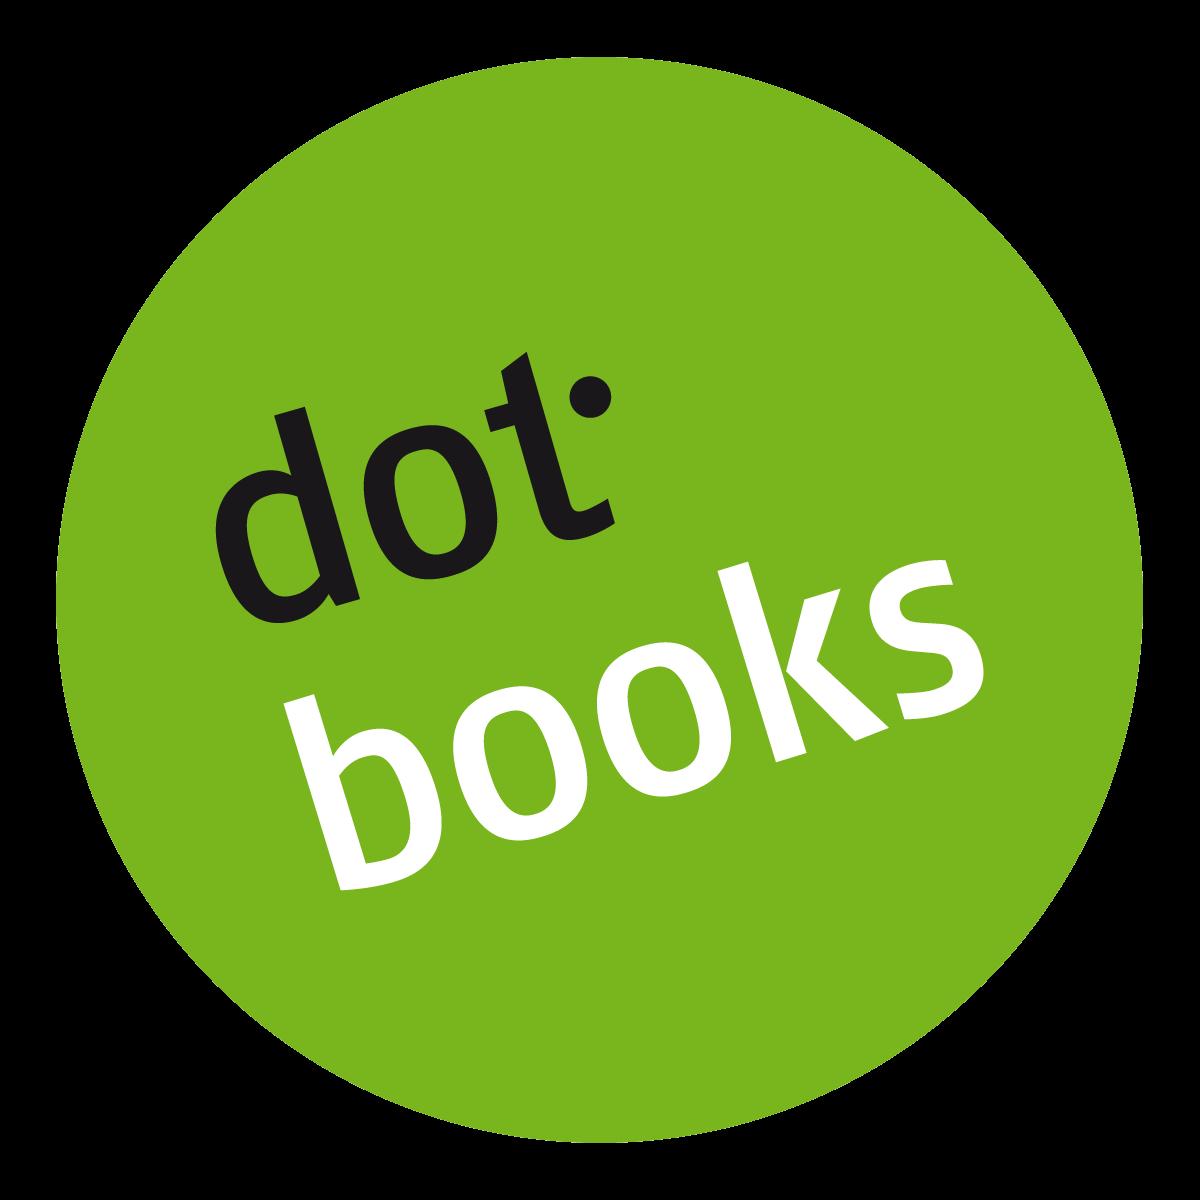 dotbooks